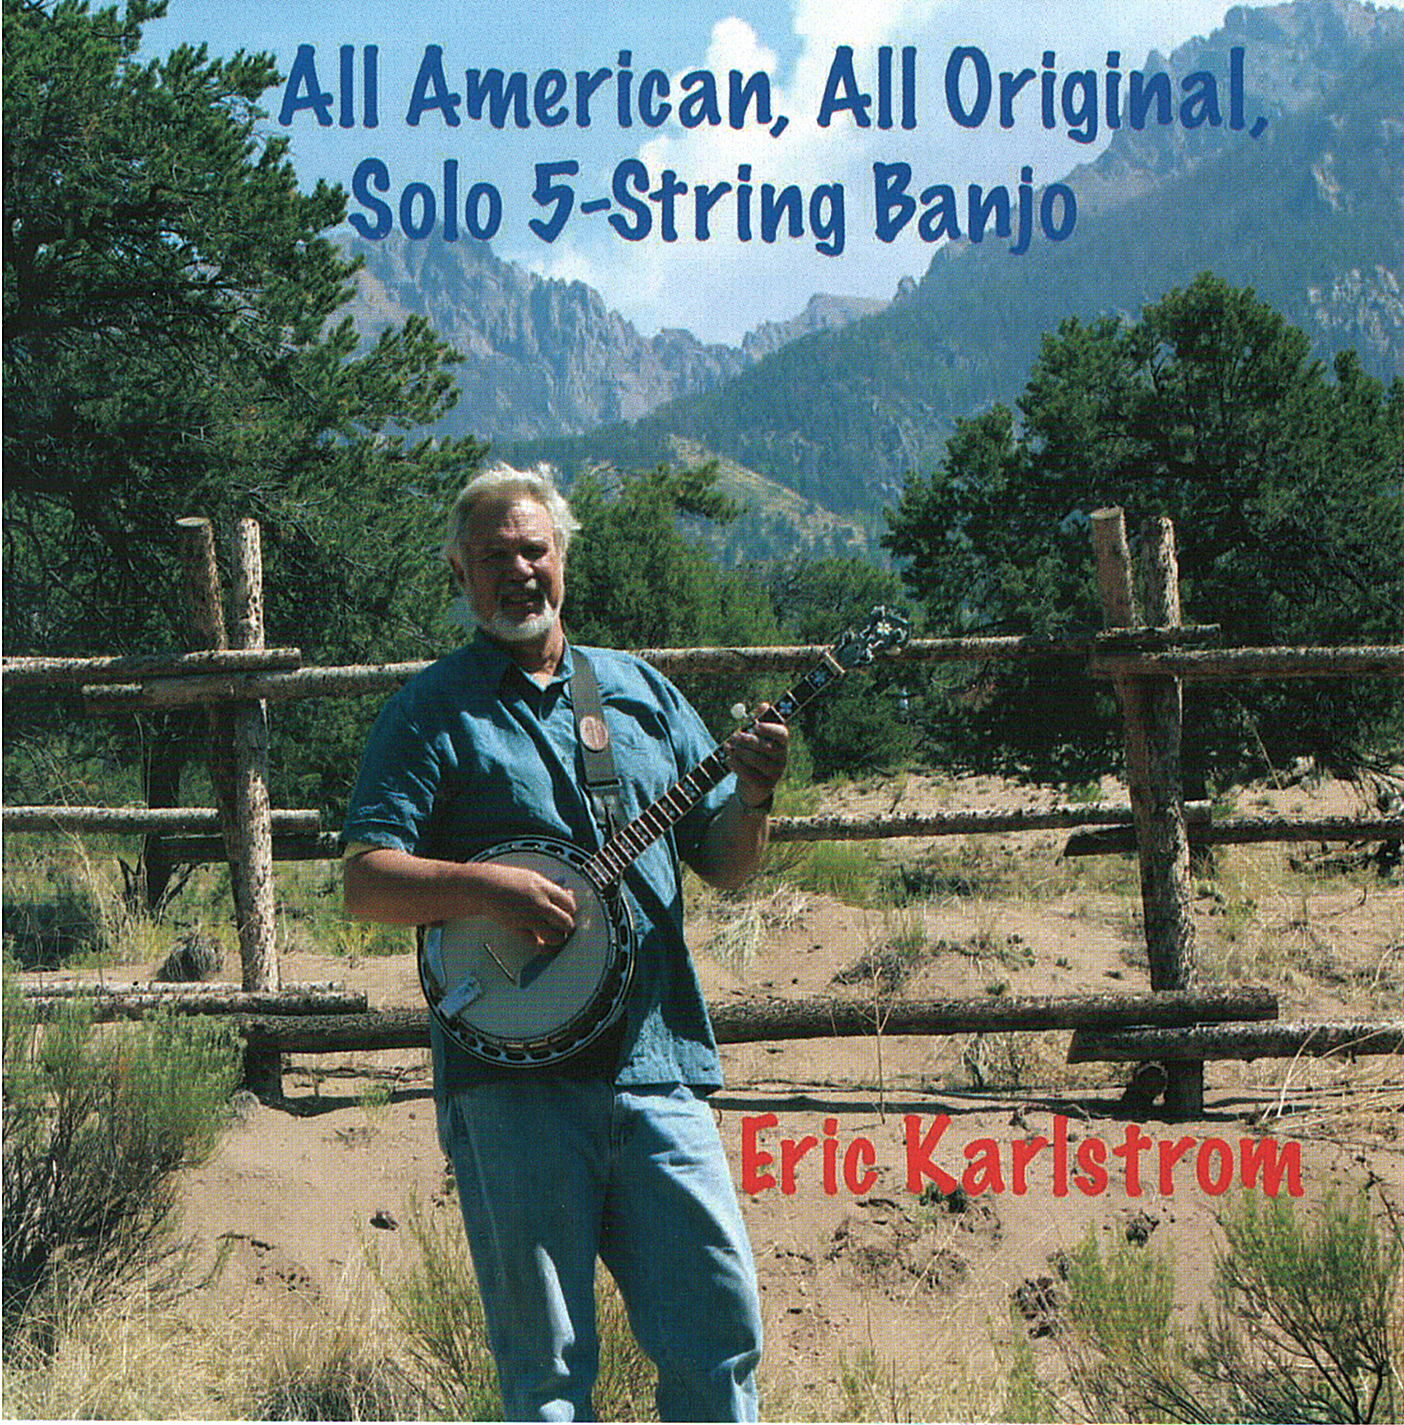 all american banjo